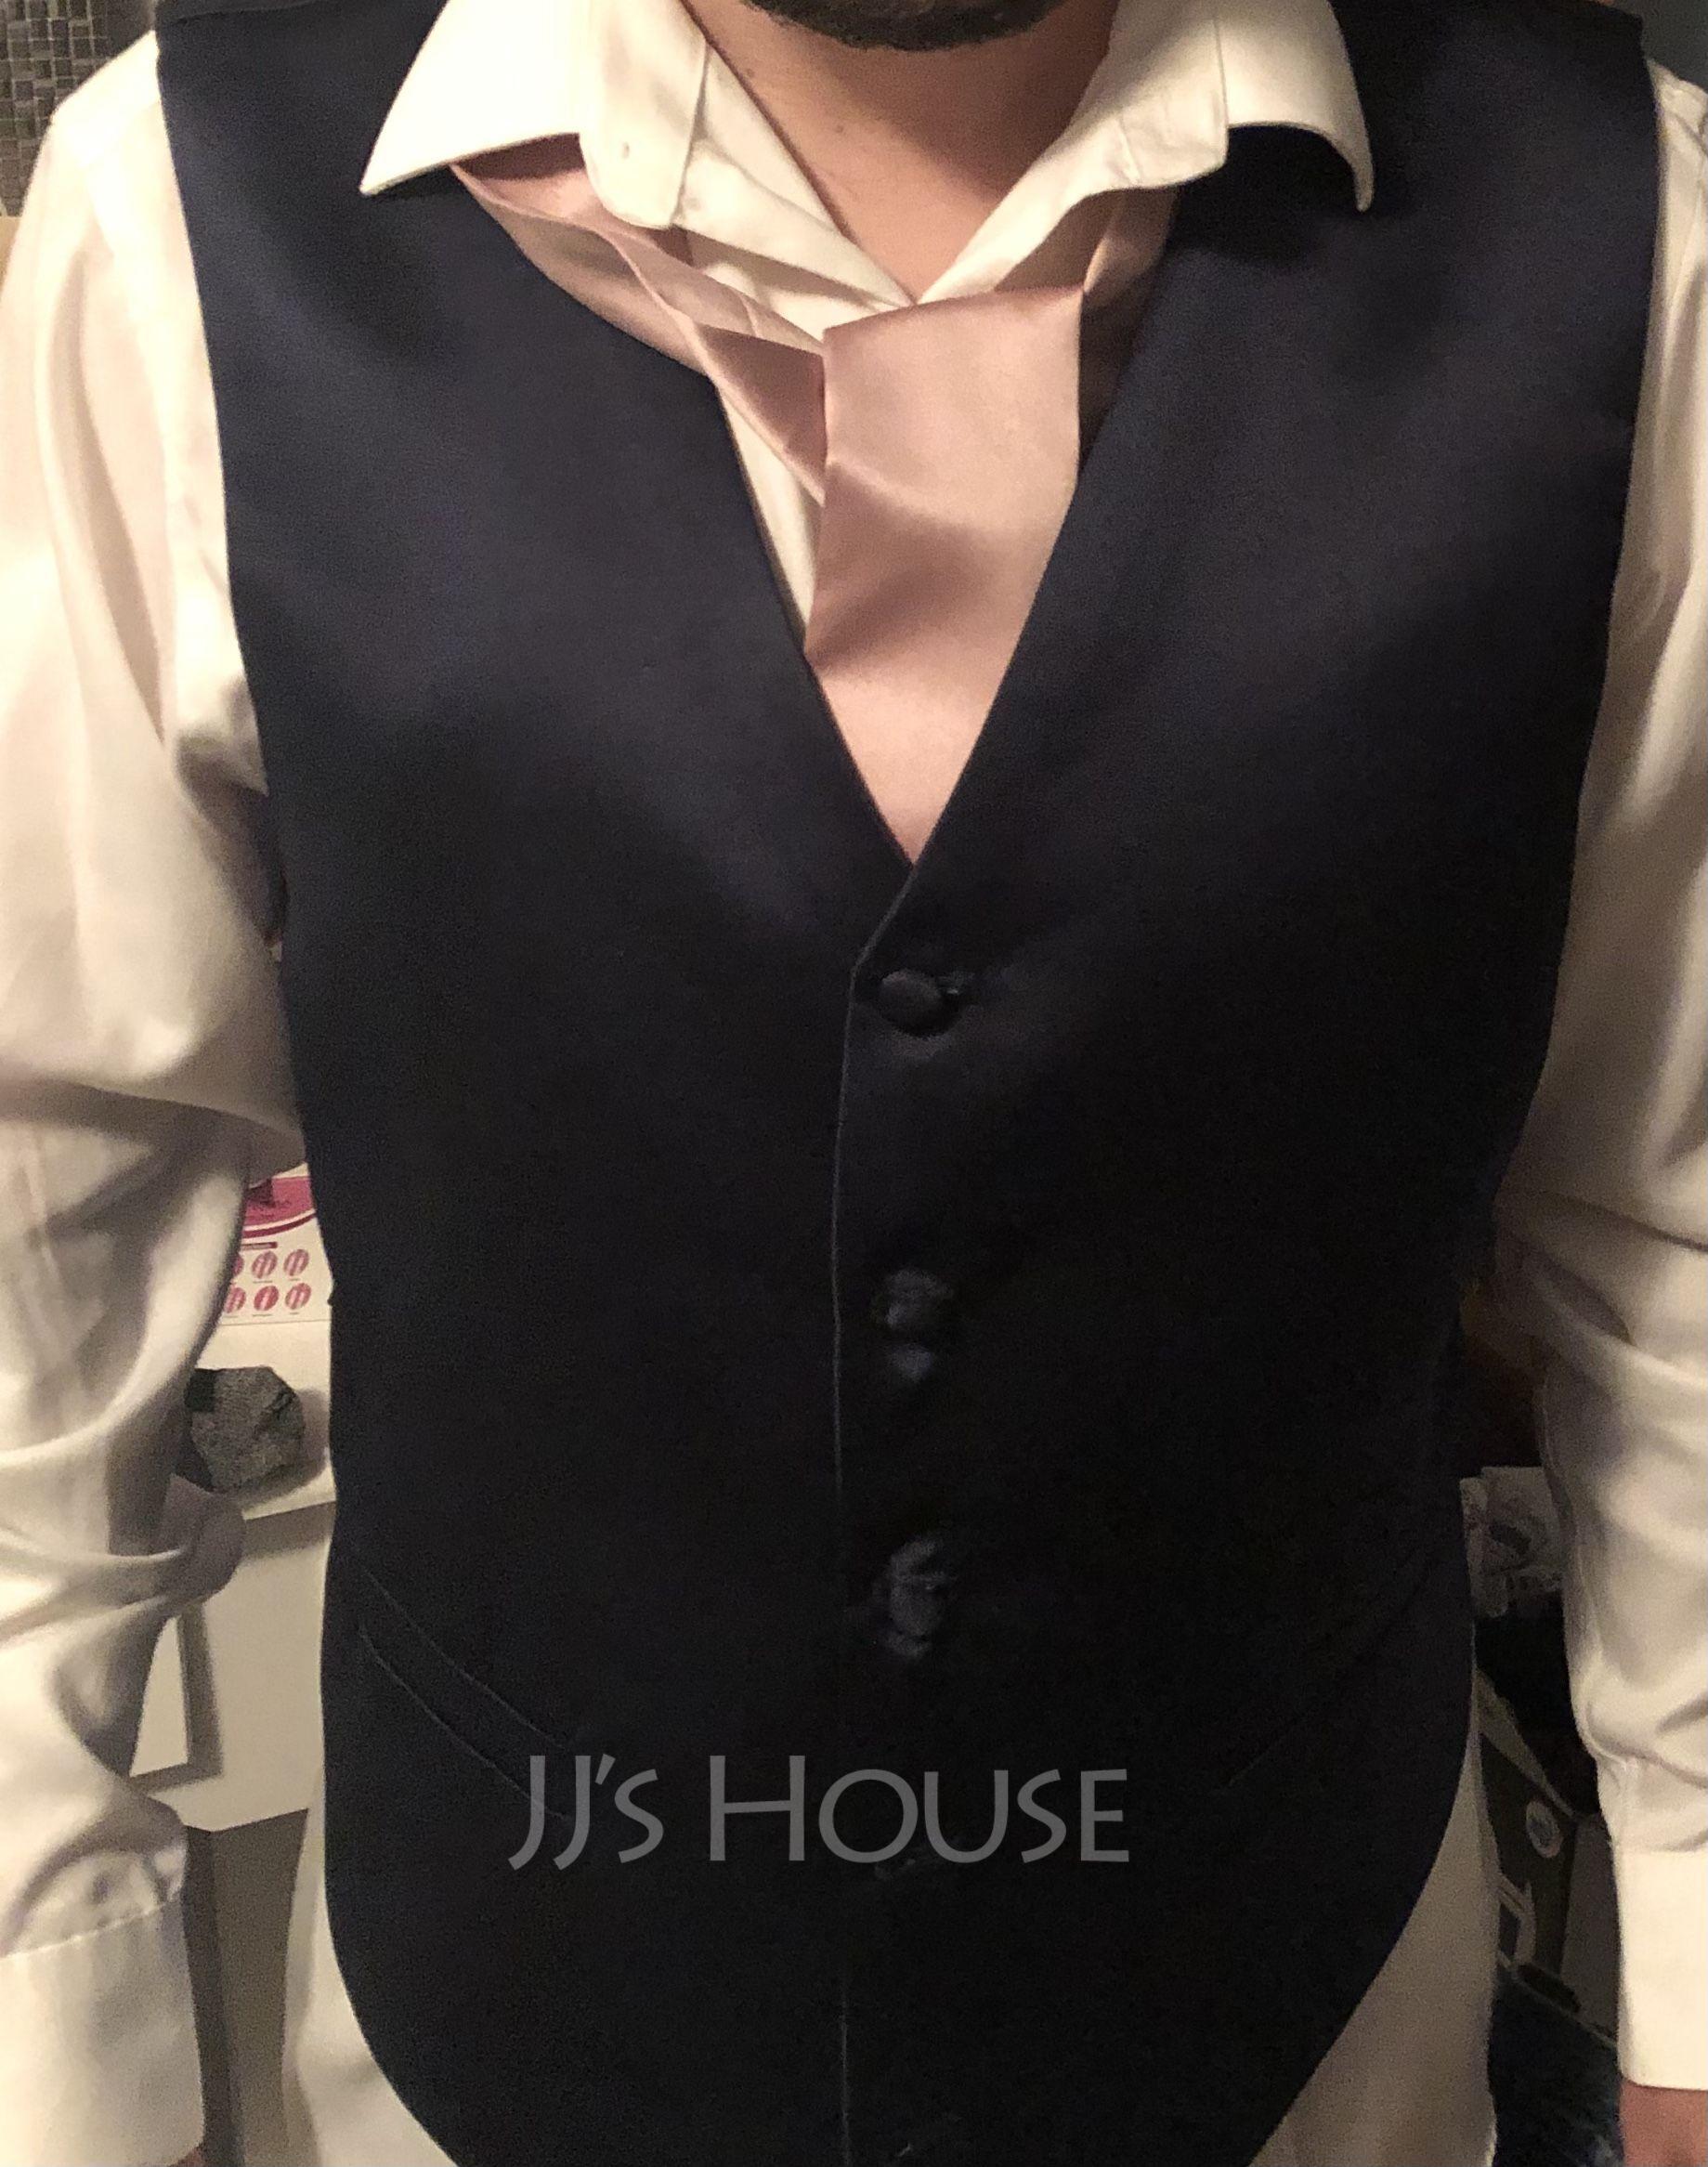 JJ's House Satin Formal Vest/Waistcoat